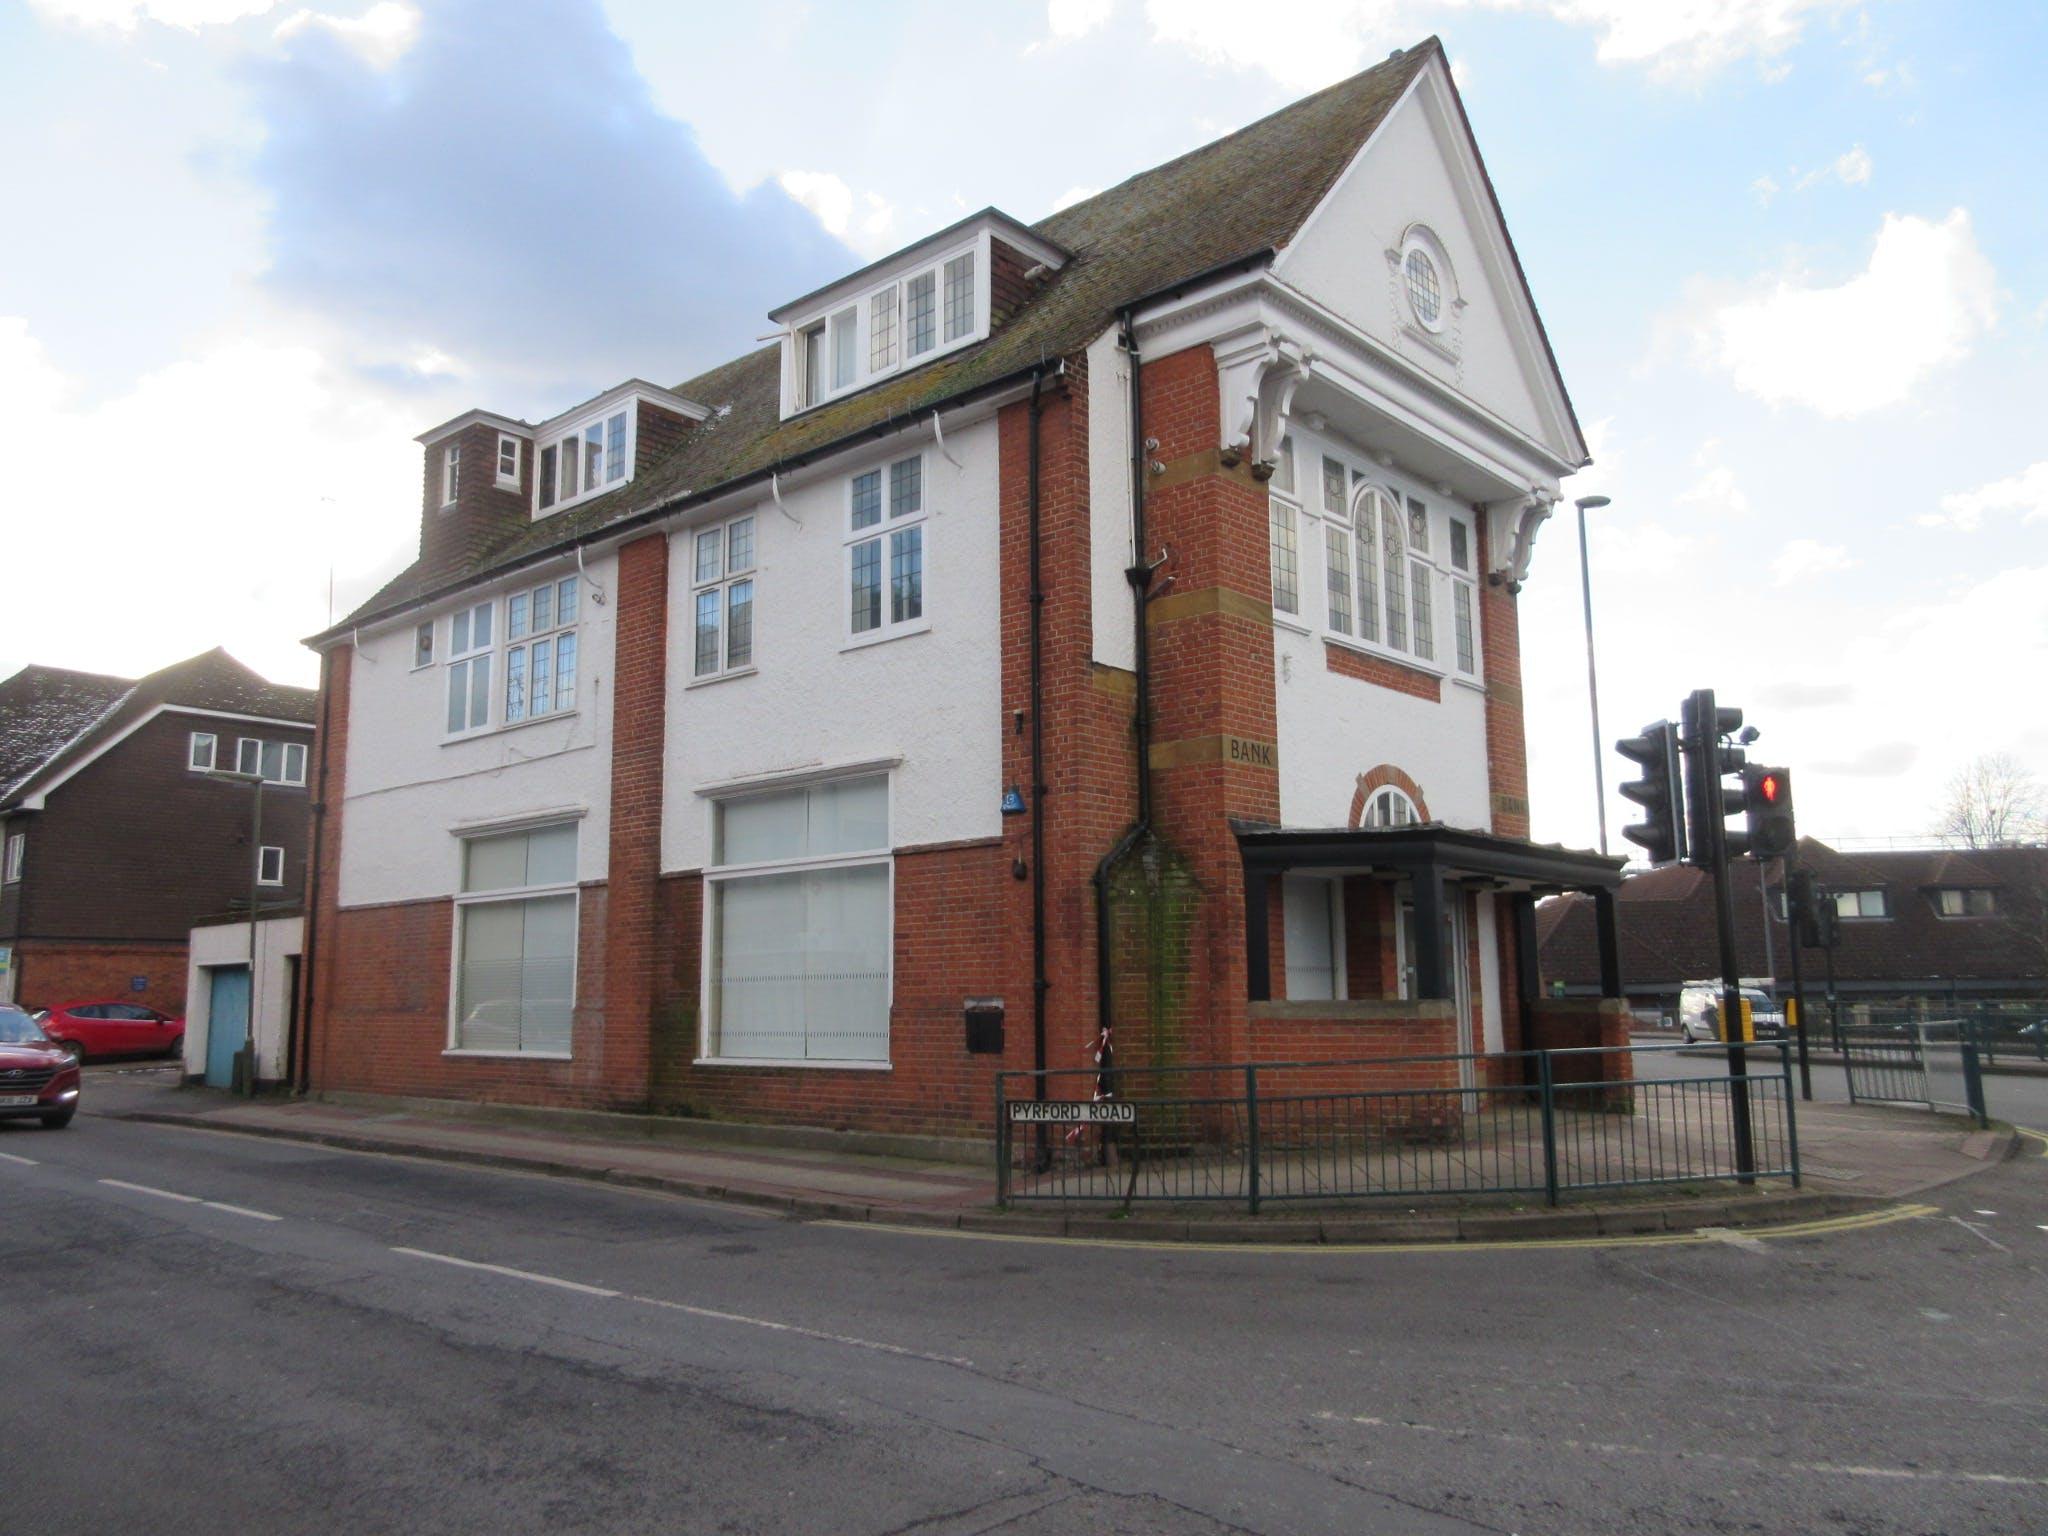 25 Old Woking Road, West Byfleet, Retail / Offices To Let - IMG_8971.JPG